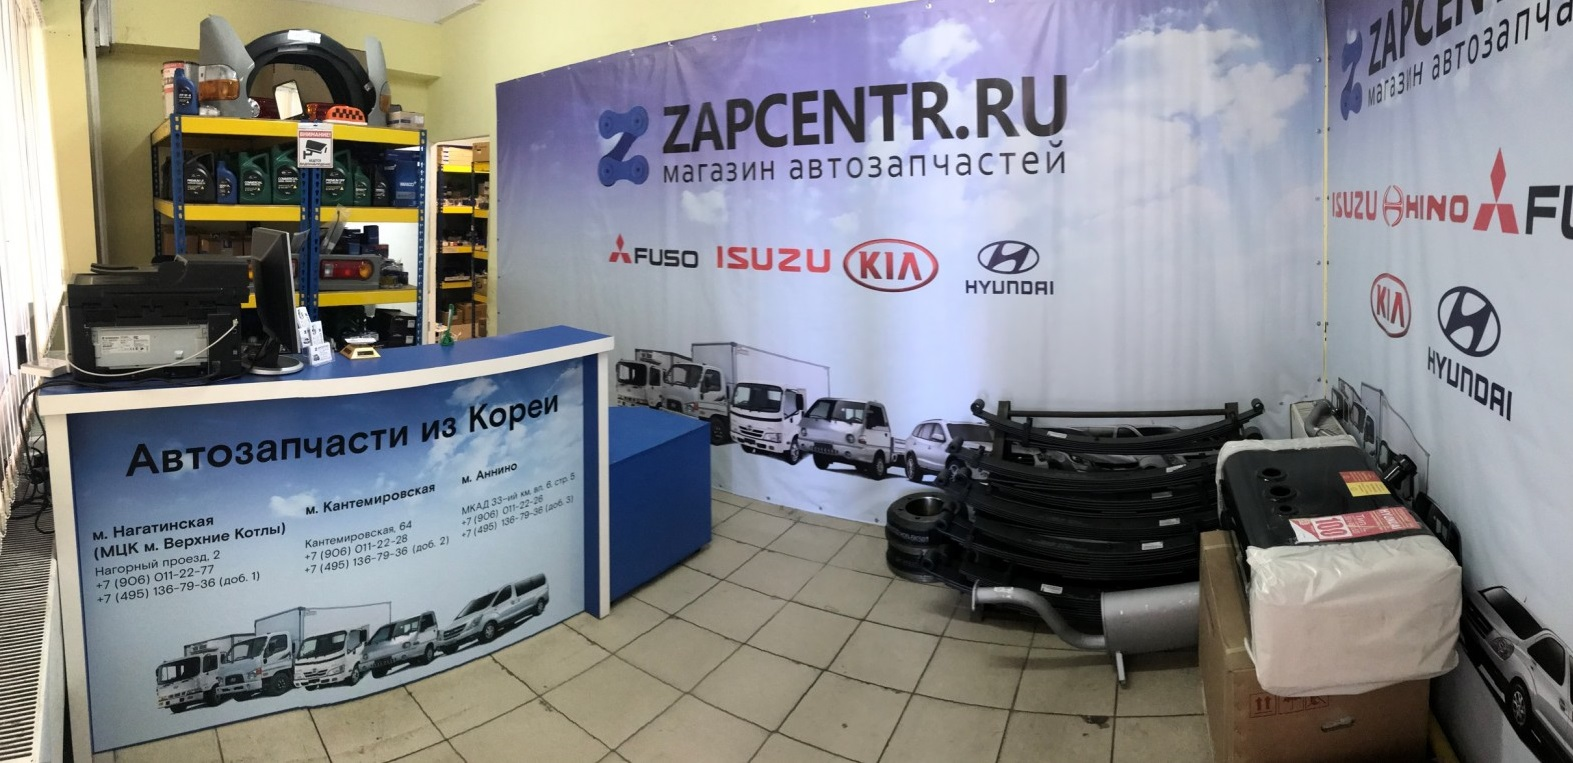 Новый филиал магазина ZAPCENTR на МКАД.